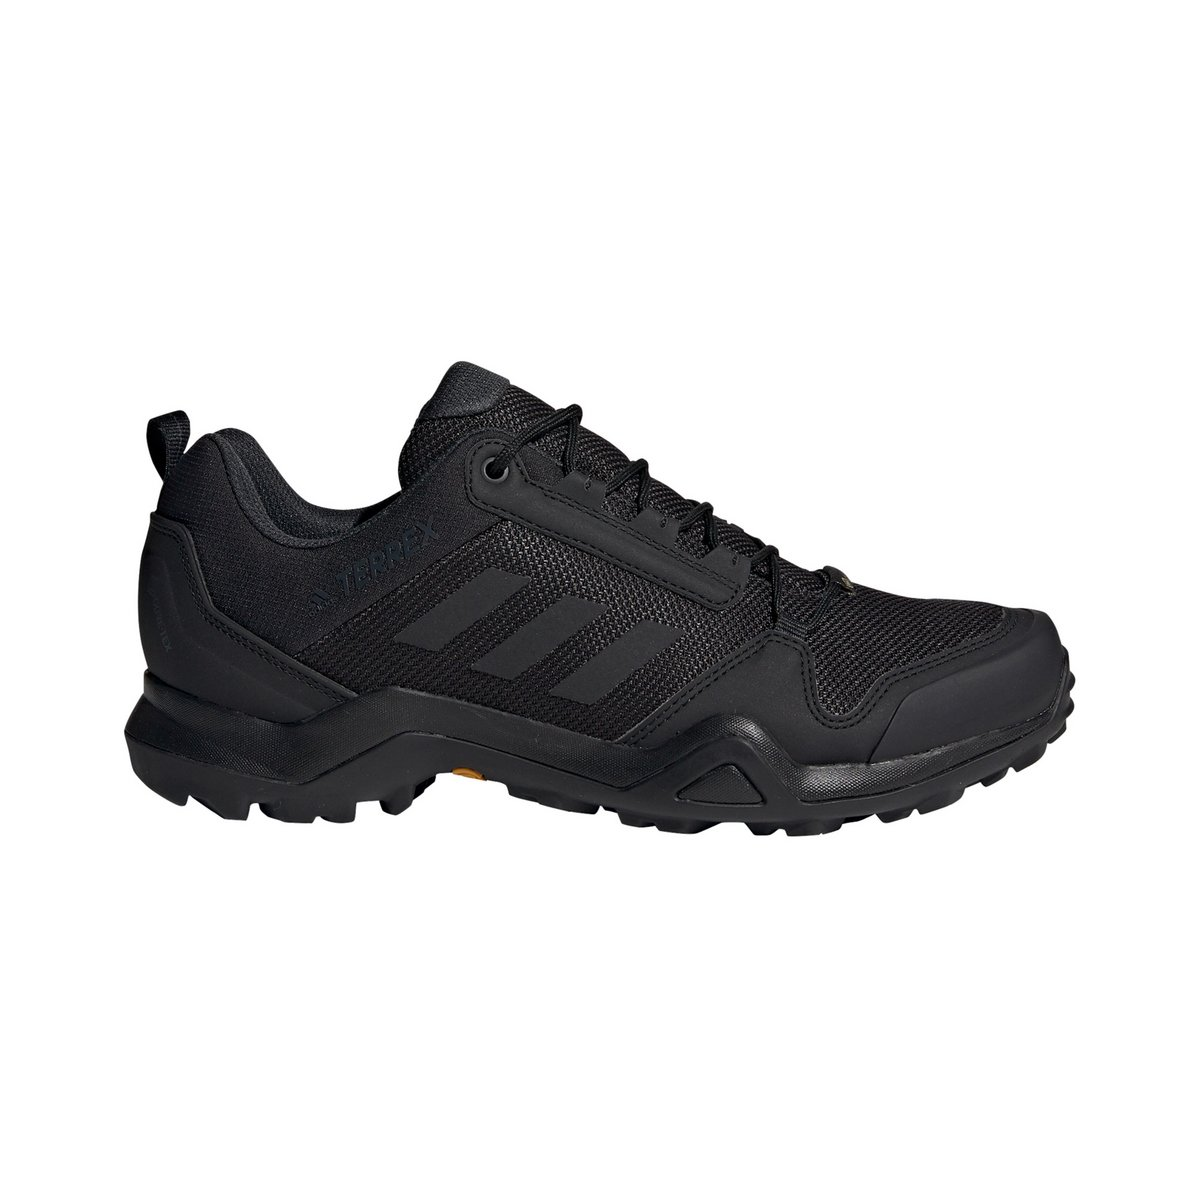 Adidas Terrex Men's Terrex AX3 GORE-TEX Walking Shoes 0